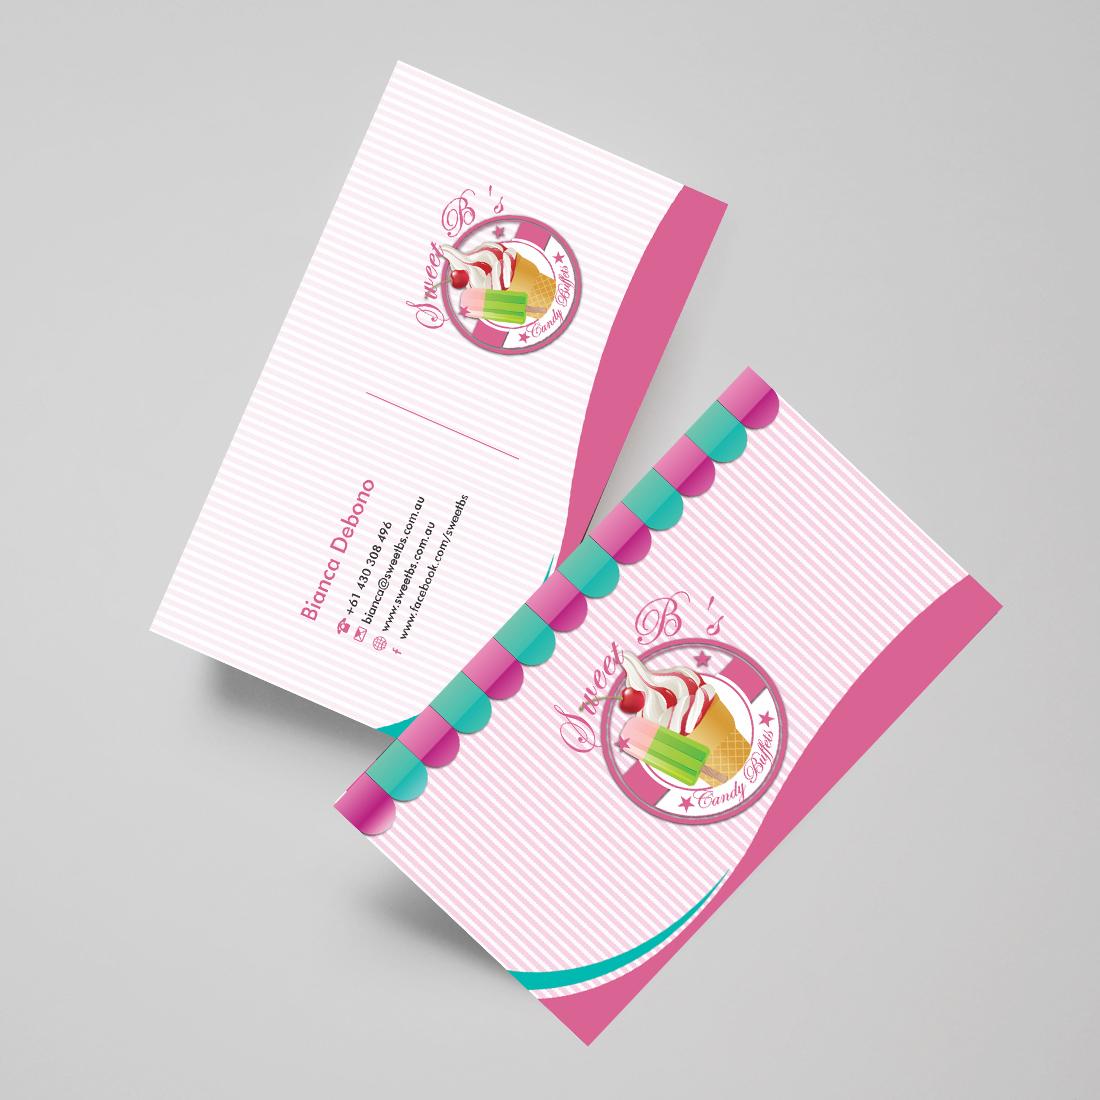 Playful modern business business card design for kathleen noonan t business card design by gtools for kathleen noonan tas lafemme tours design colourmoves